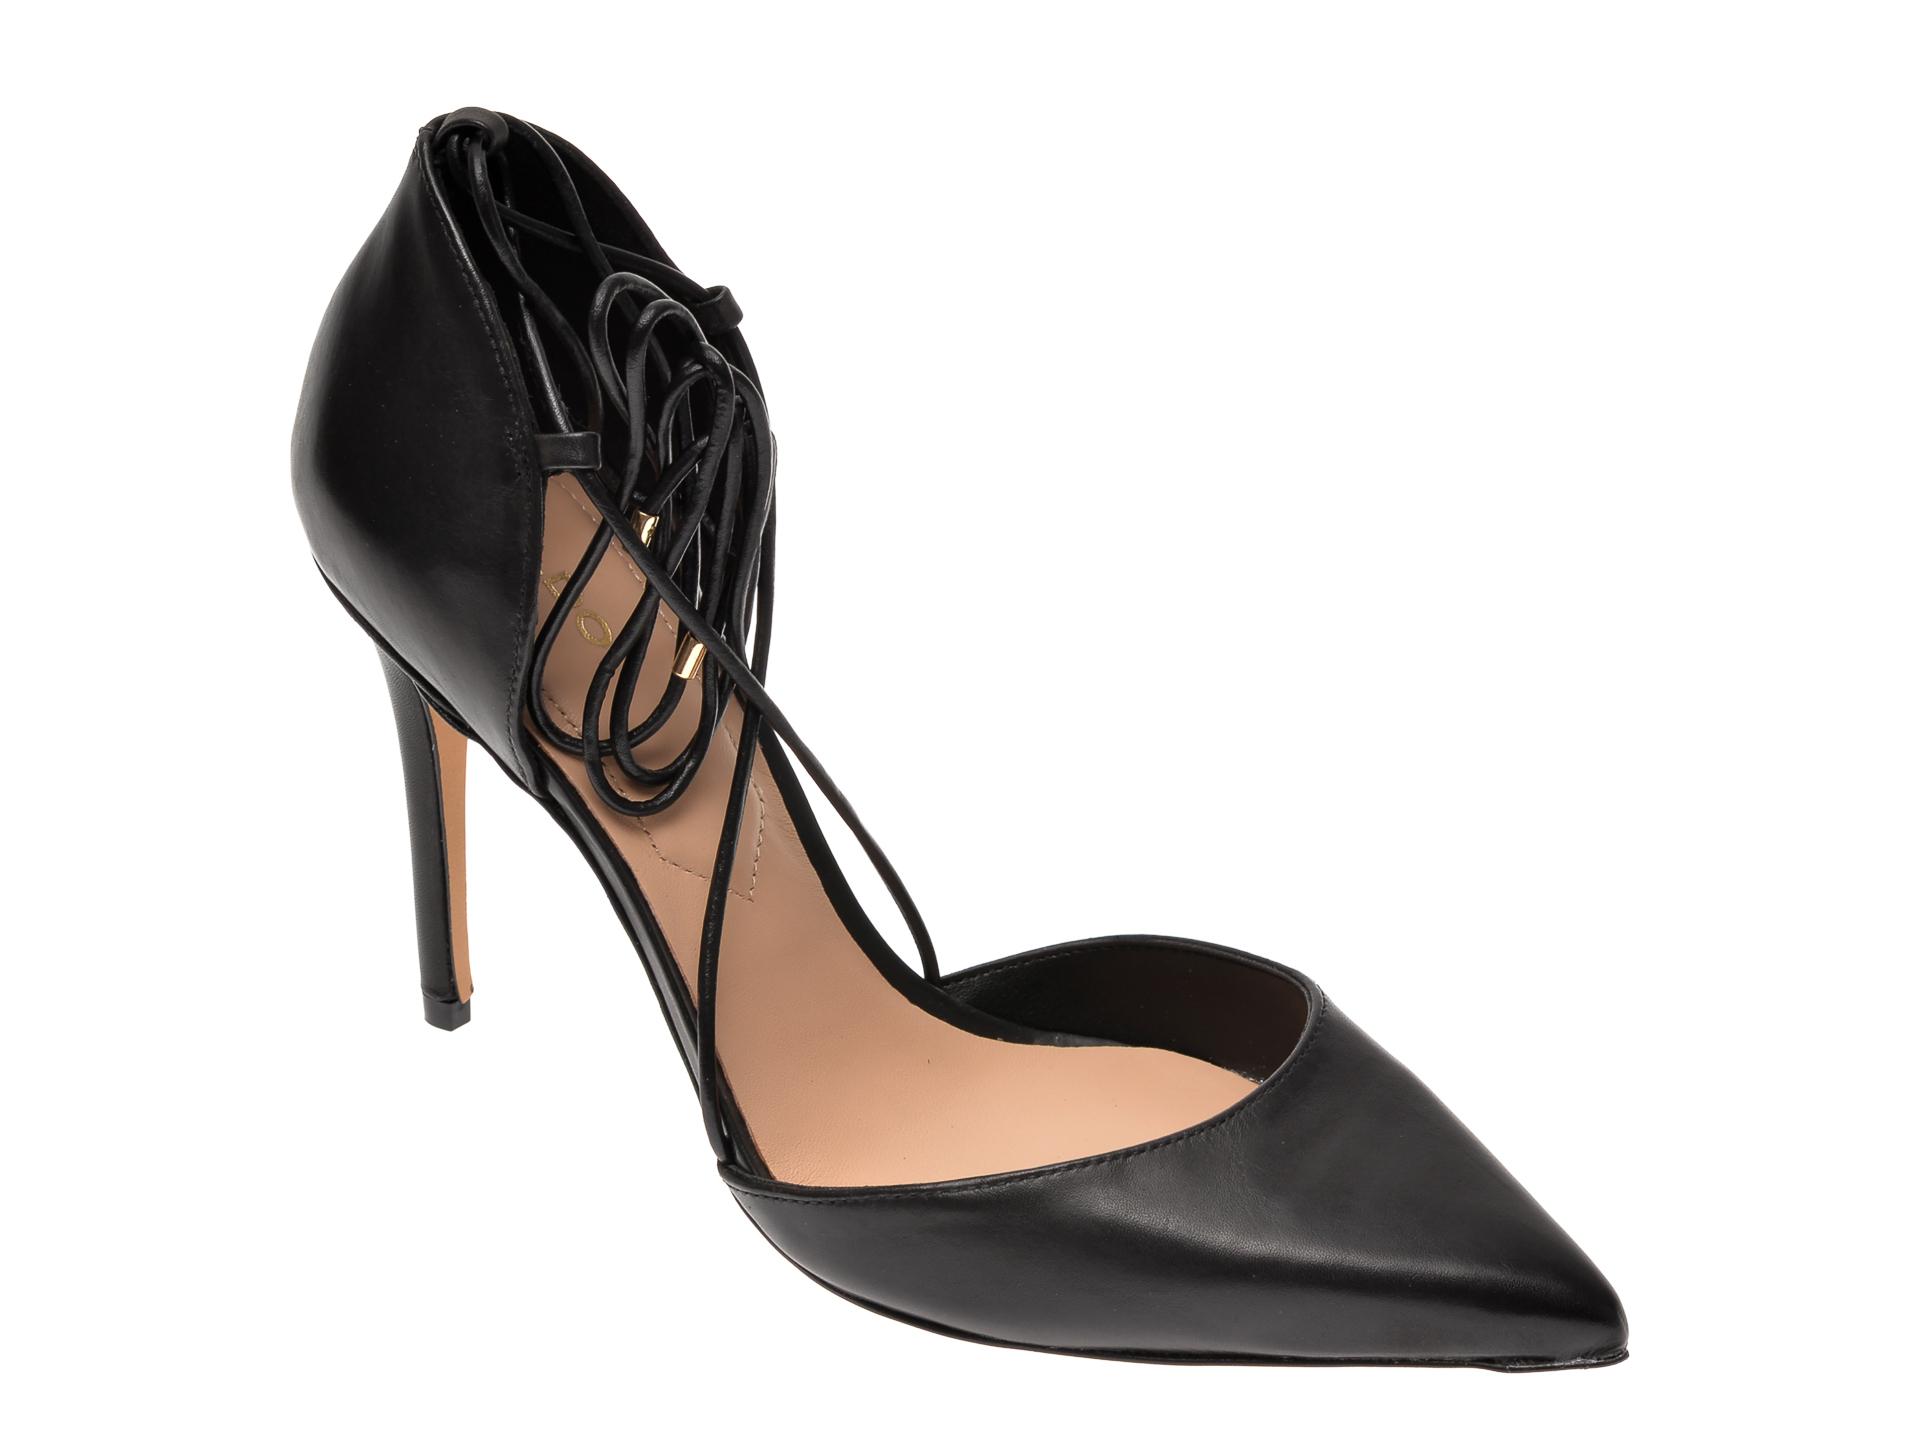 Pantofi ALDO negri, Finsbury001, din piele naturala imagine otter.ro 2021